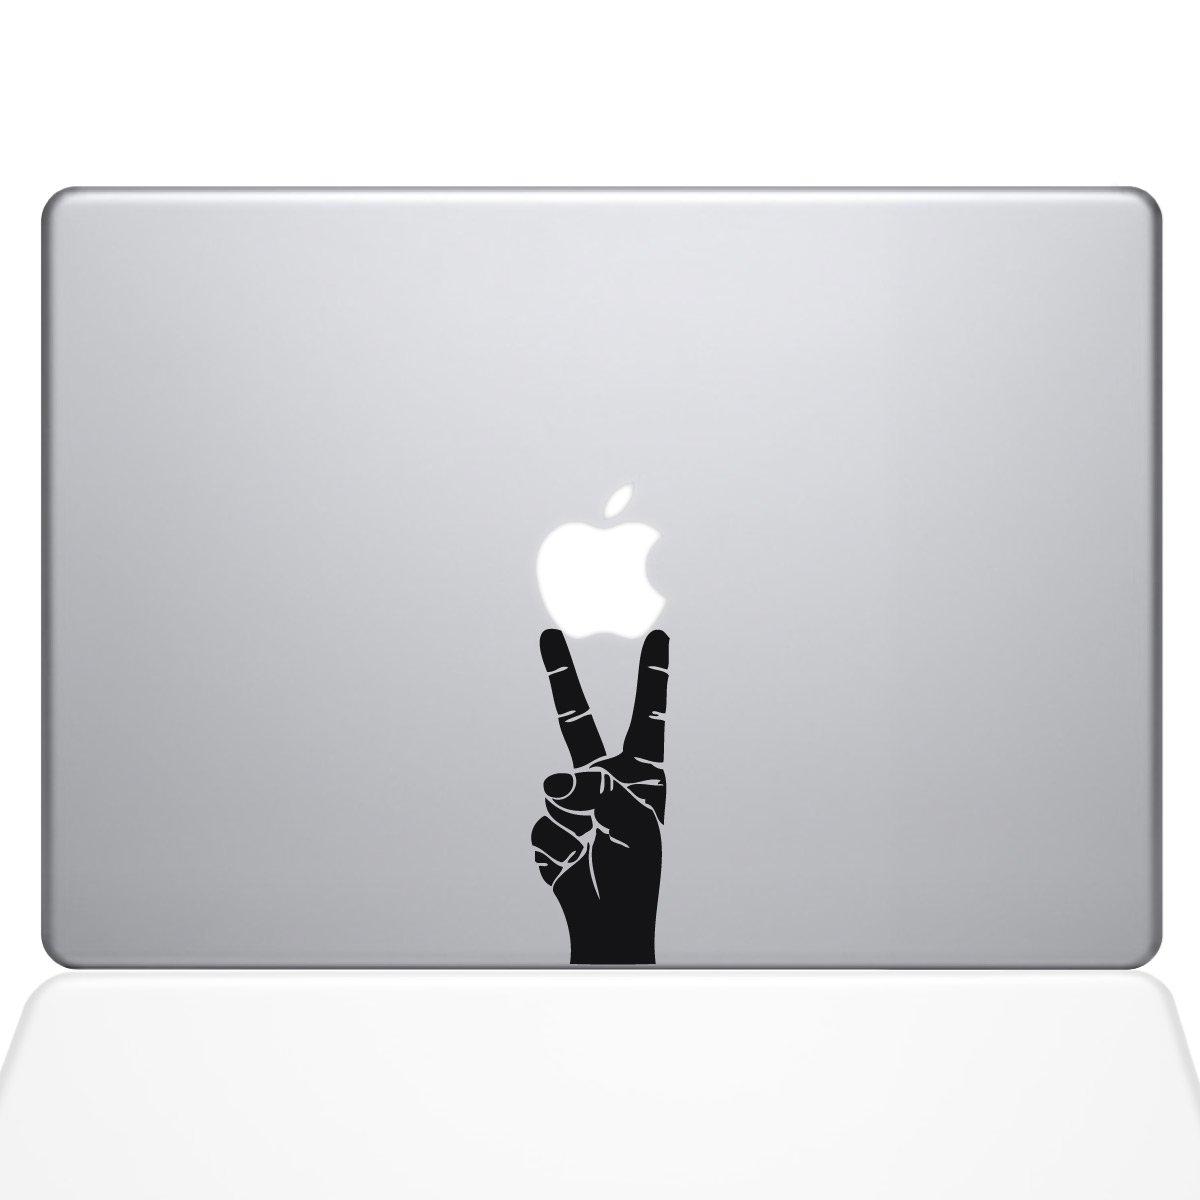 The Decal Guru Peace Sign Hand MacBook Decal Vinyl Sticker - 13'' Macbook Pro (2015 & older) - Black (1147-MAC-13P-BLA) by The Decal Guru